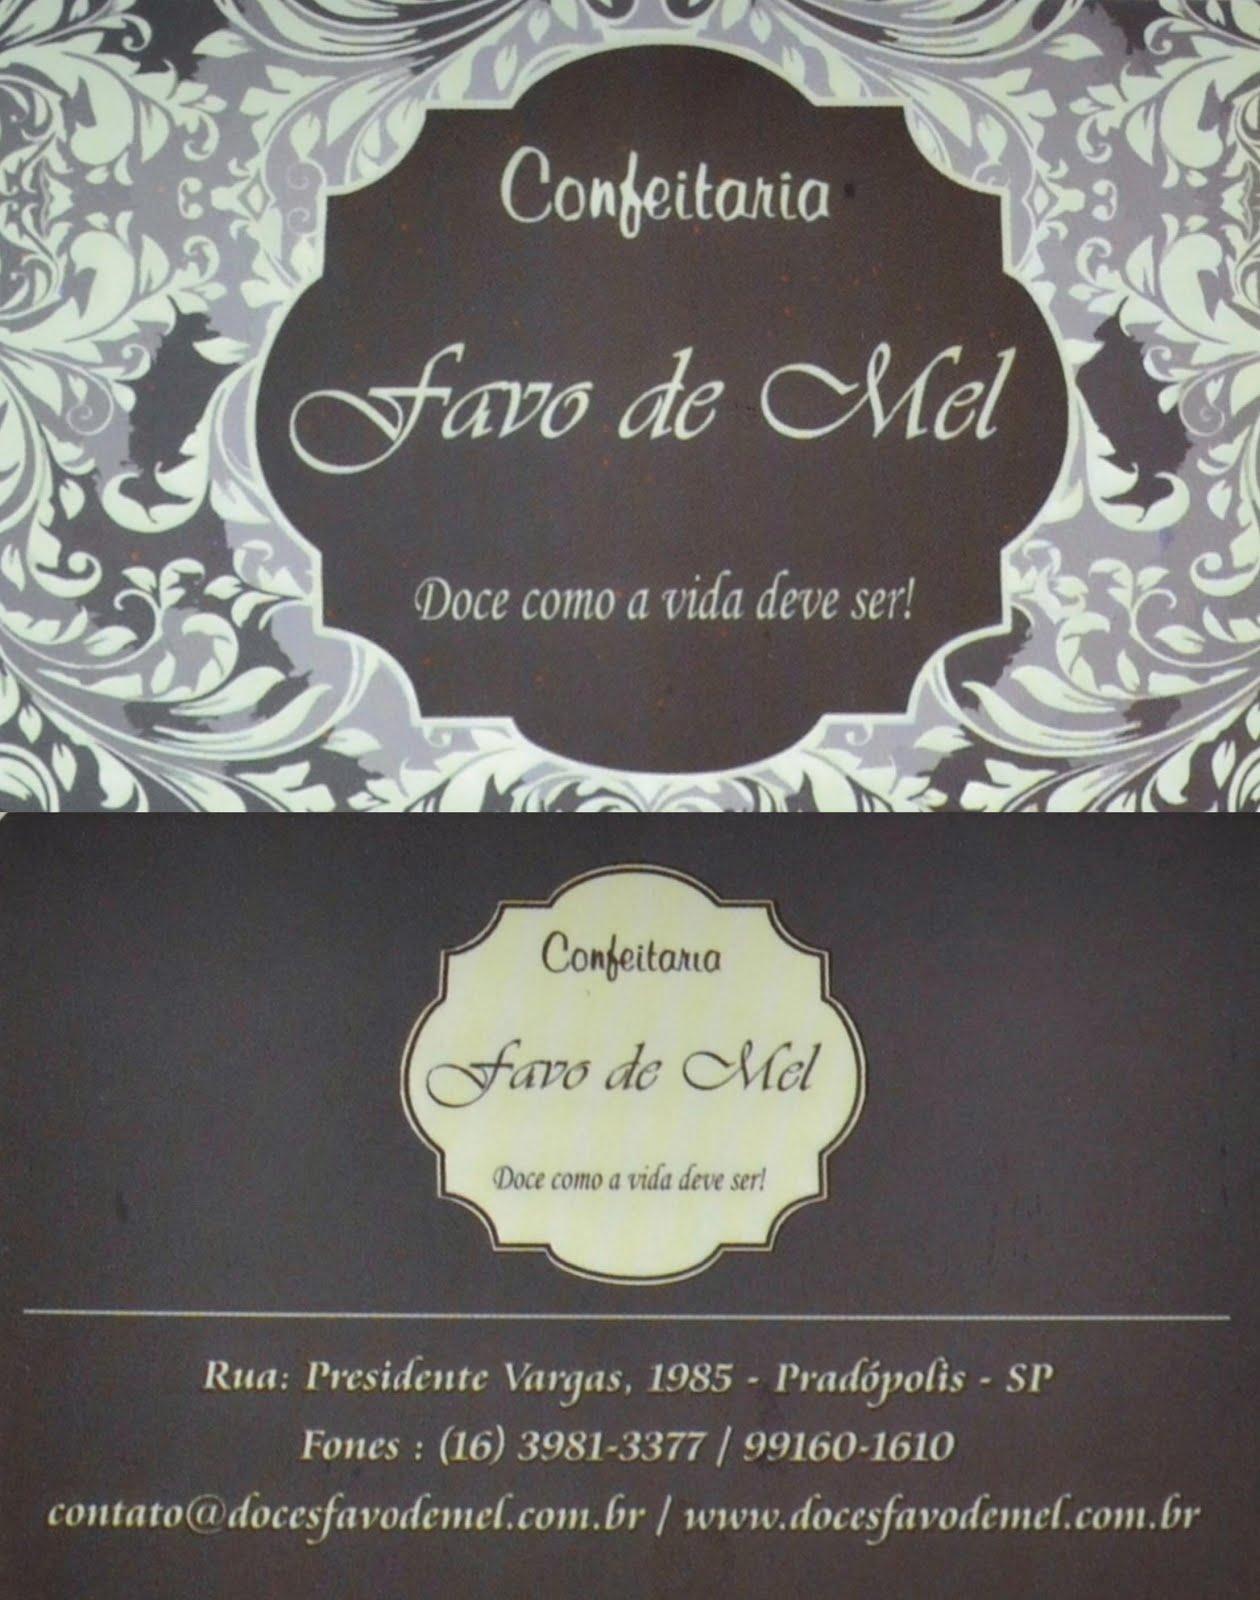 Favo de Mel 16-39813377